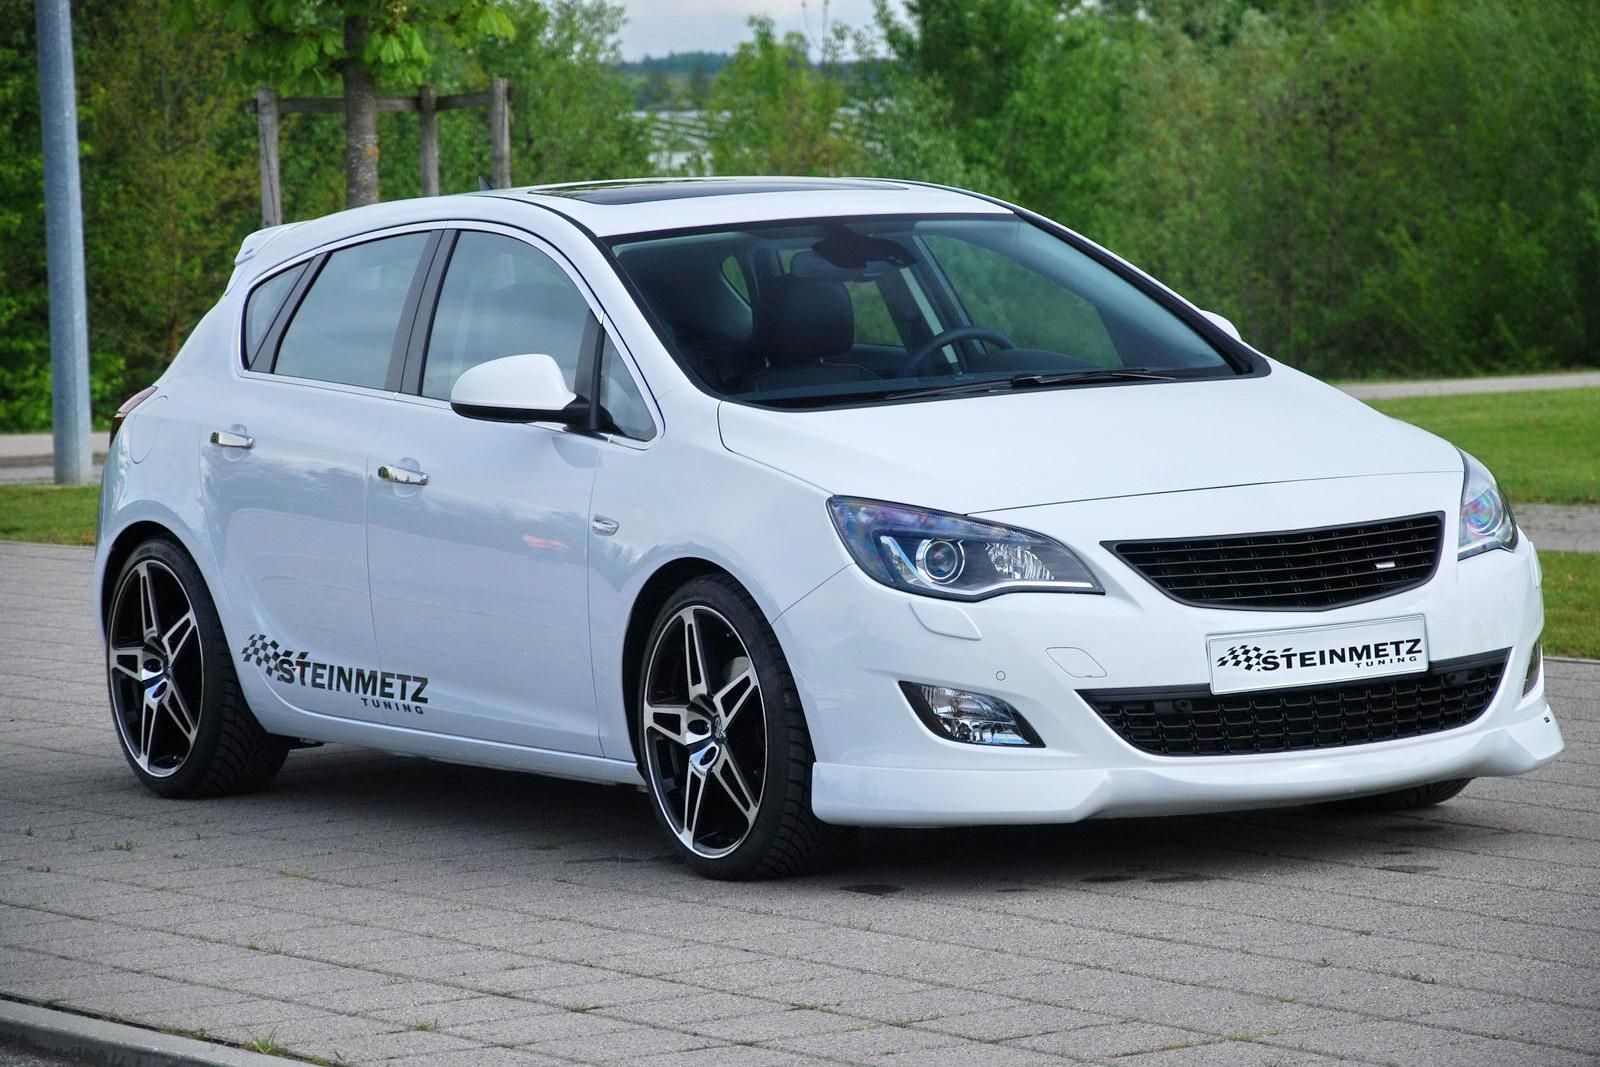 Steinmetz Spiffs Up New 2010 Opel Astra Carscoops